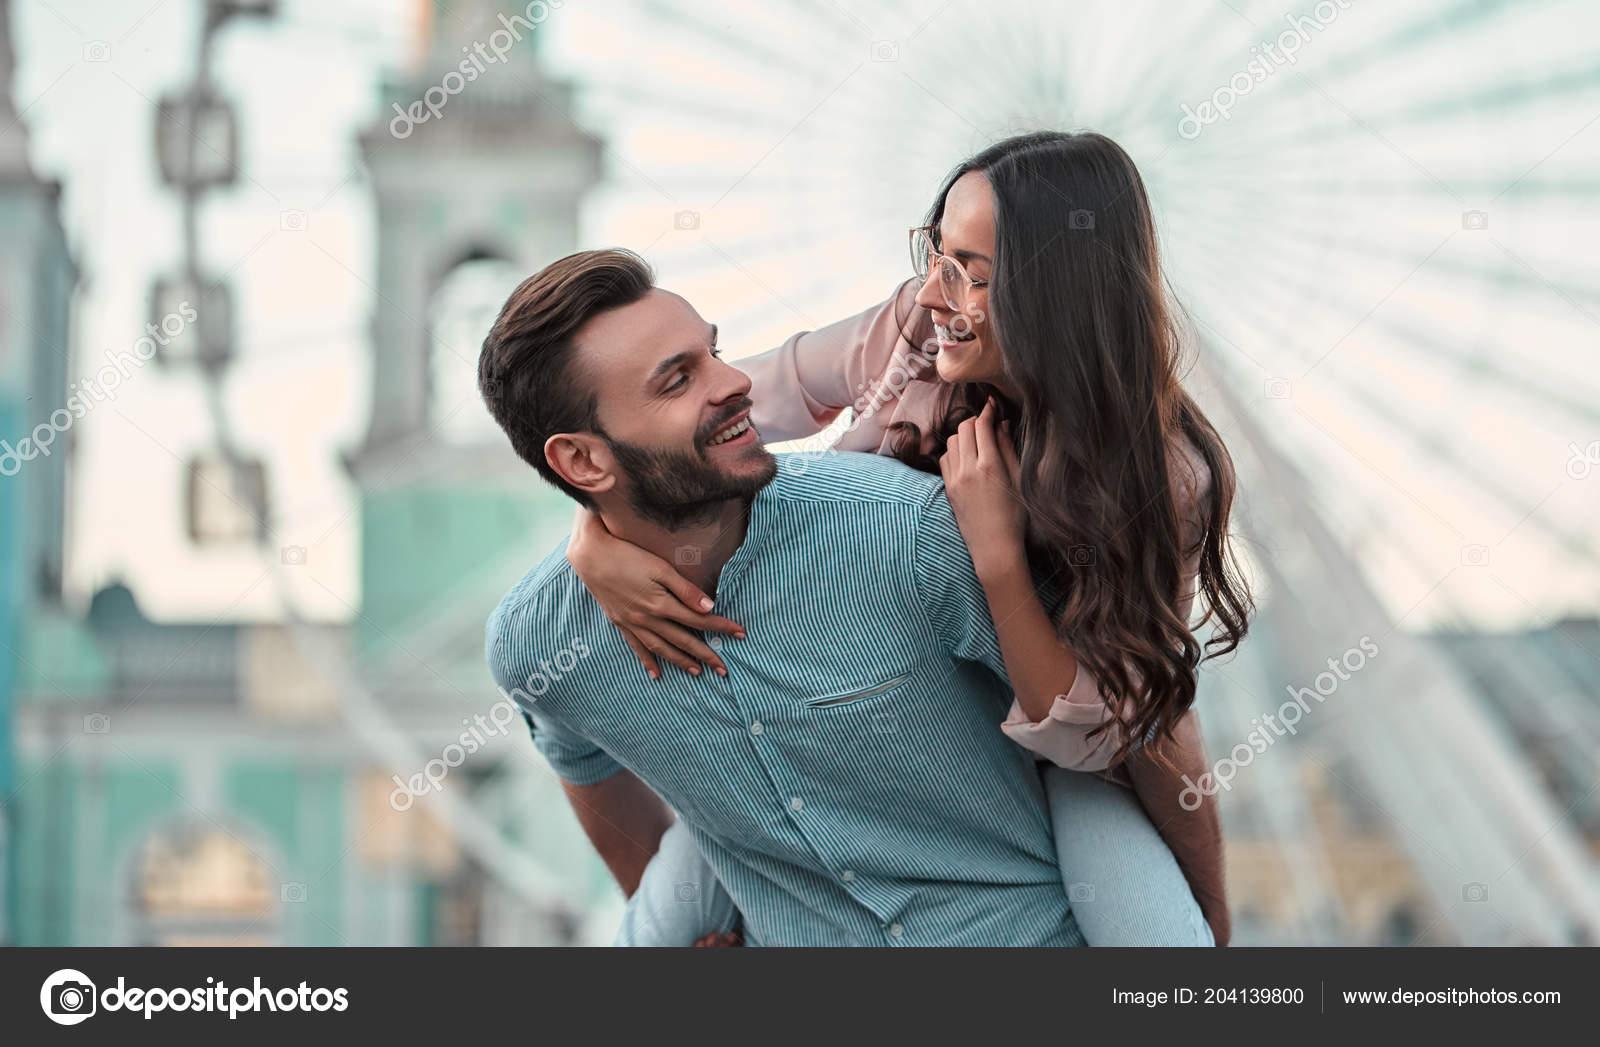 love air cute romantic